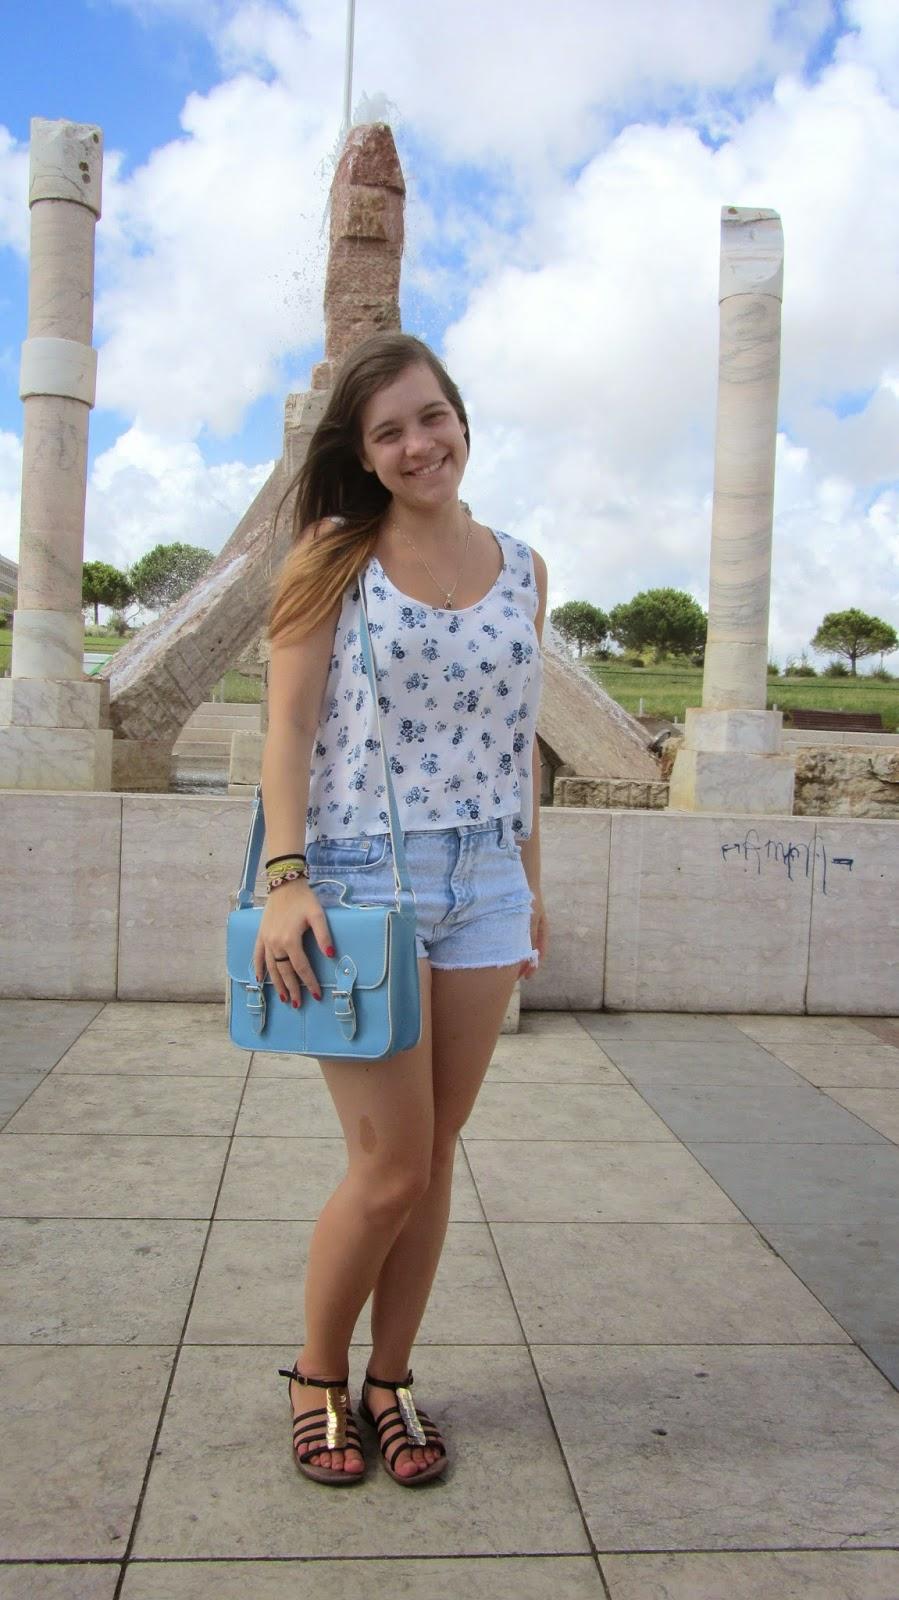 Clothes & Dreams: OOTD x3: Boa Lisboa: OOTD #1 full outfit